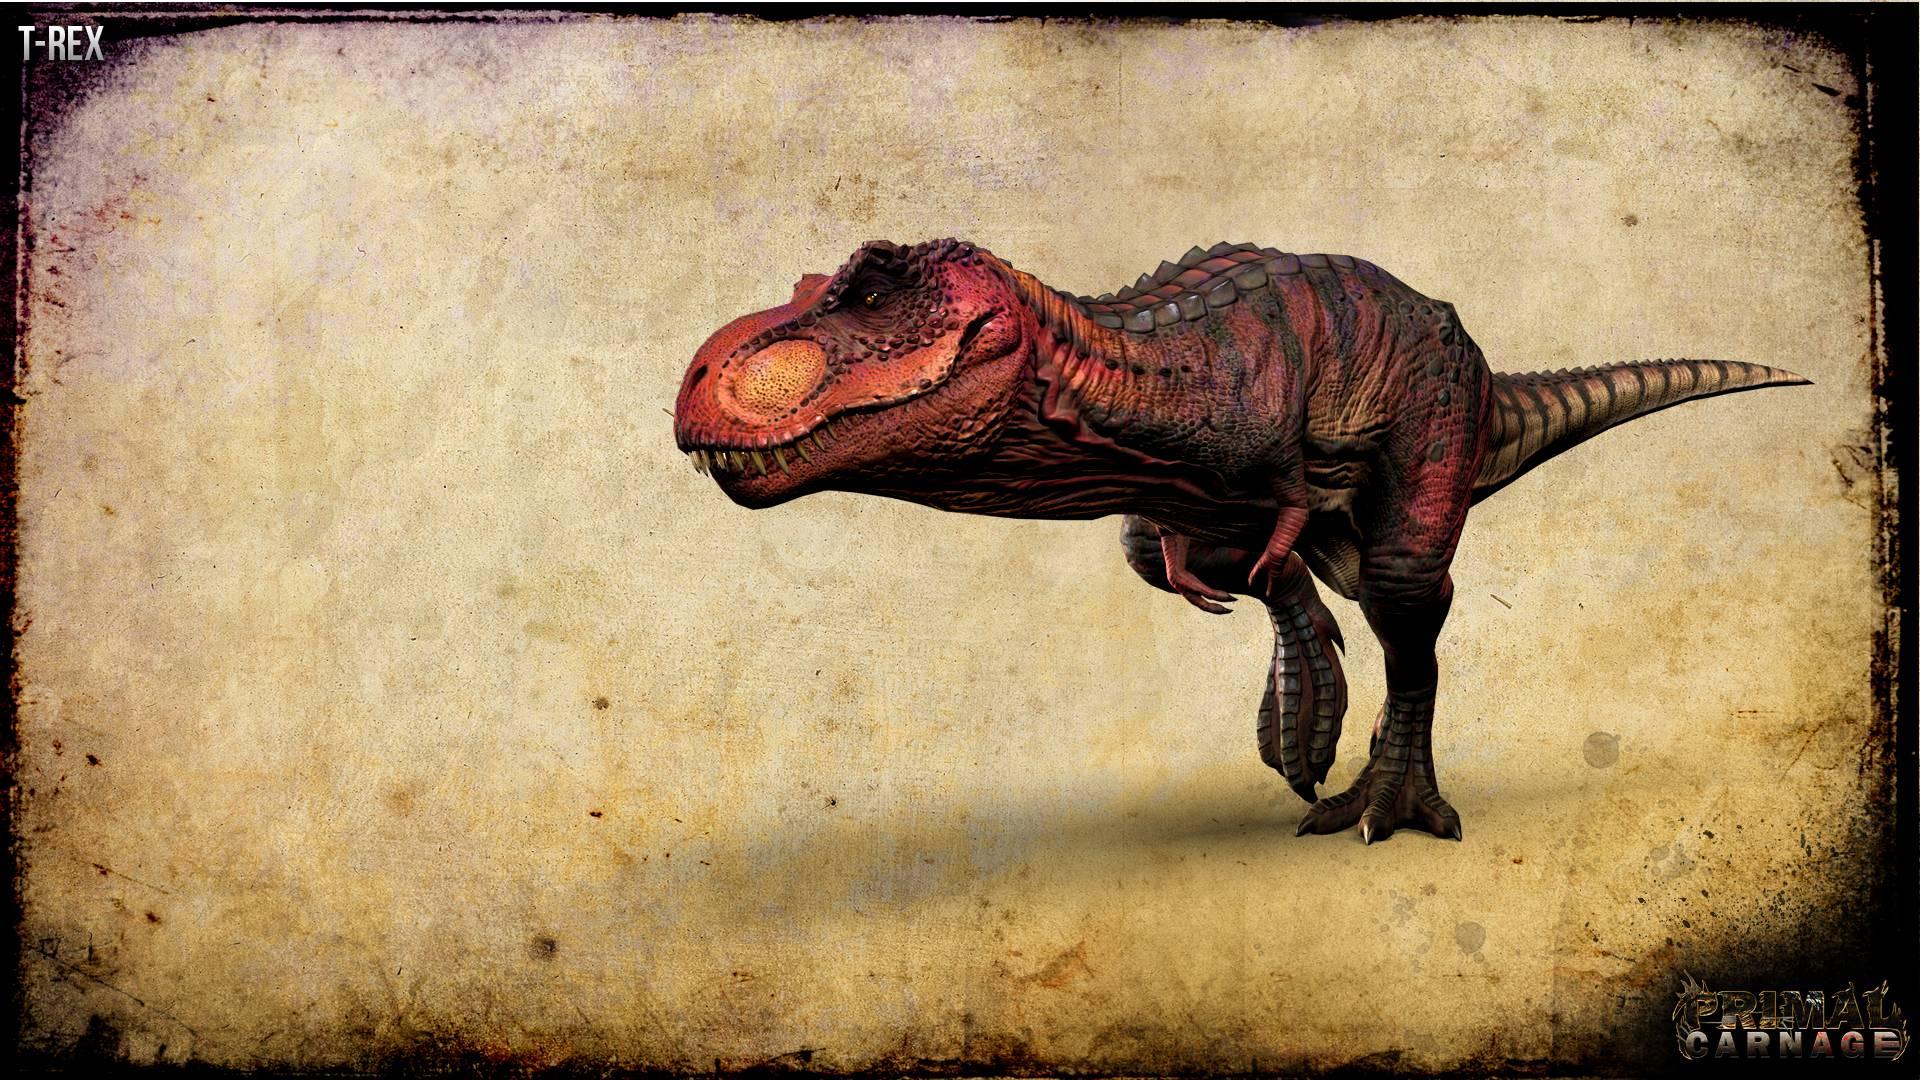 Wallpapers Tyrannosaurus Rex - Wallpaper Cave